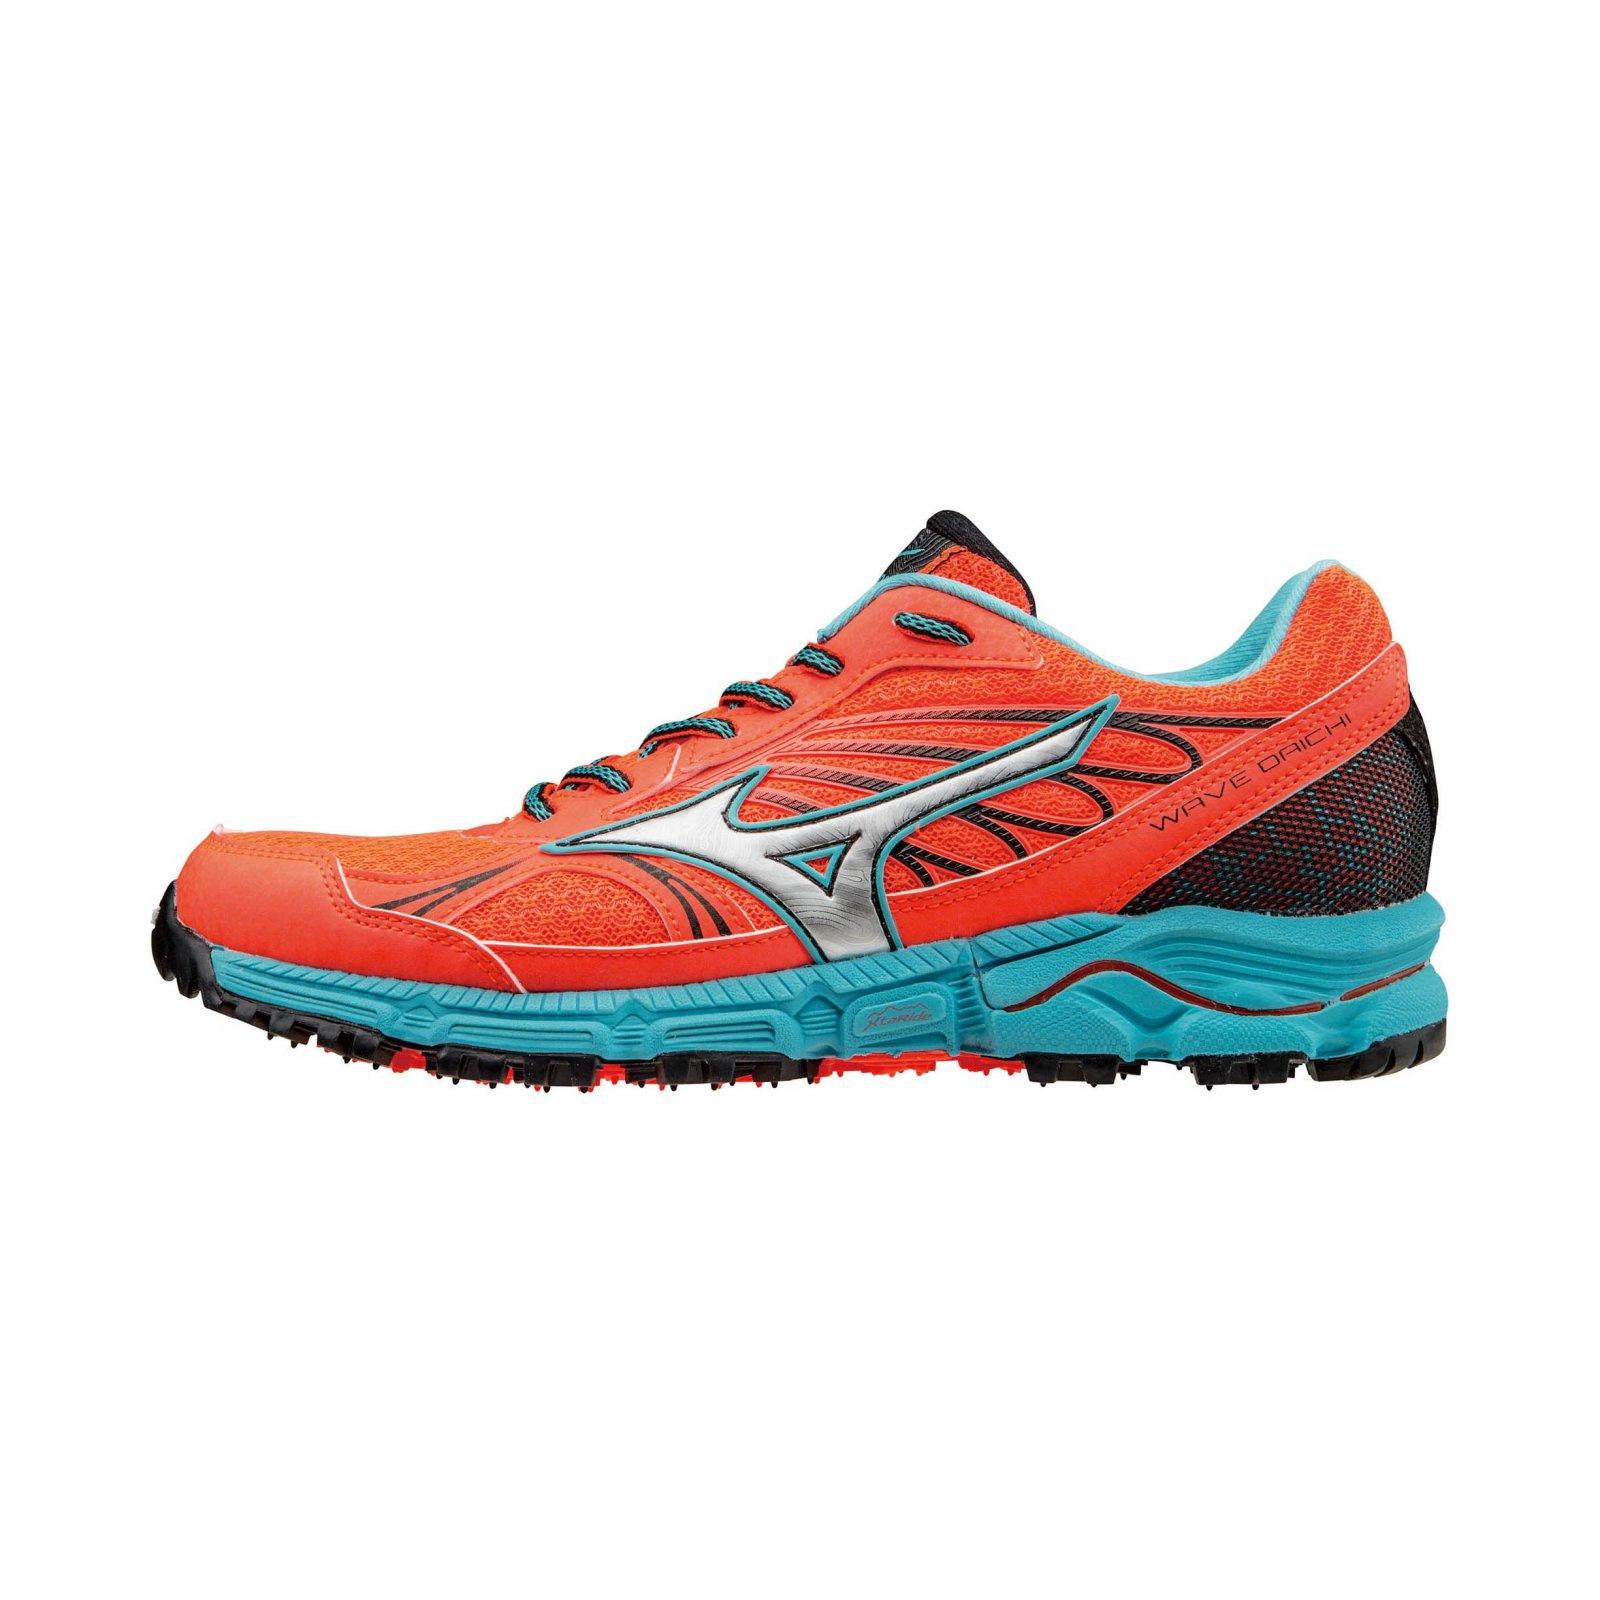 Trailové běžecké boty Mizuno Wave Daichi W J1GK167103 - Actisport.cz 8b19488ef9d